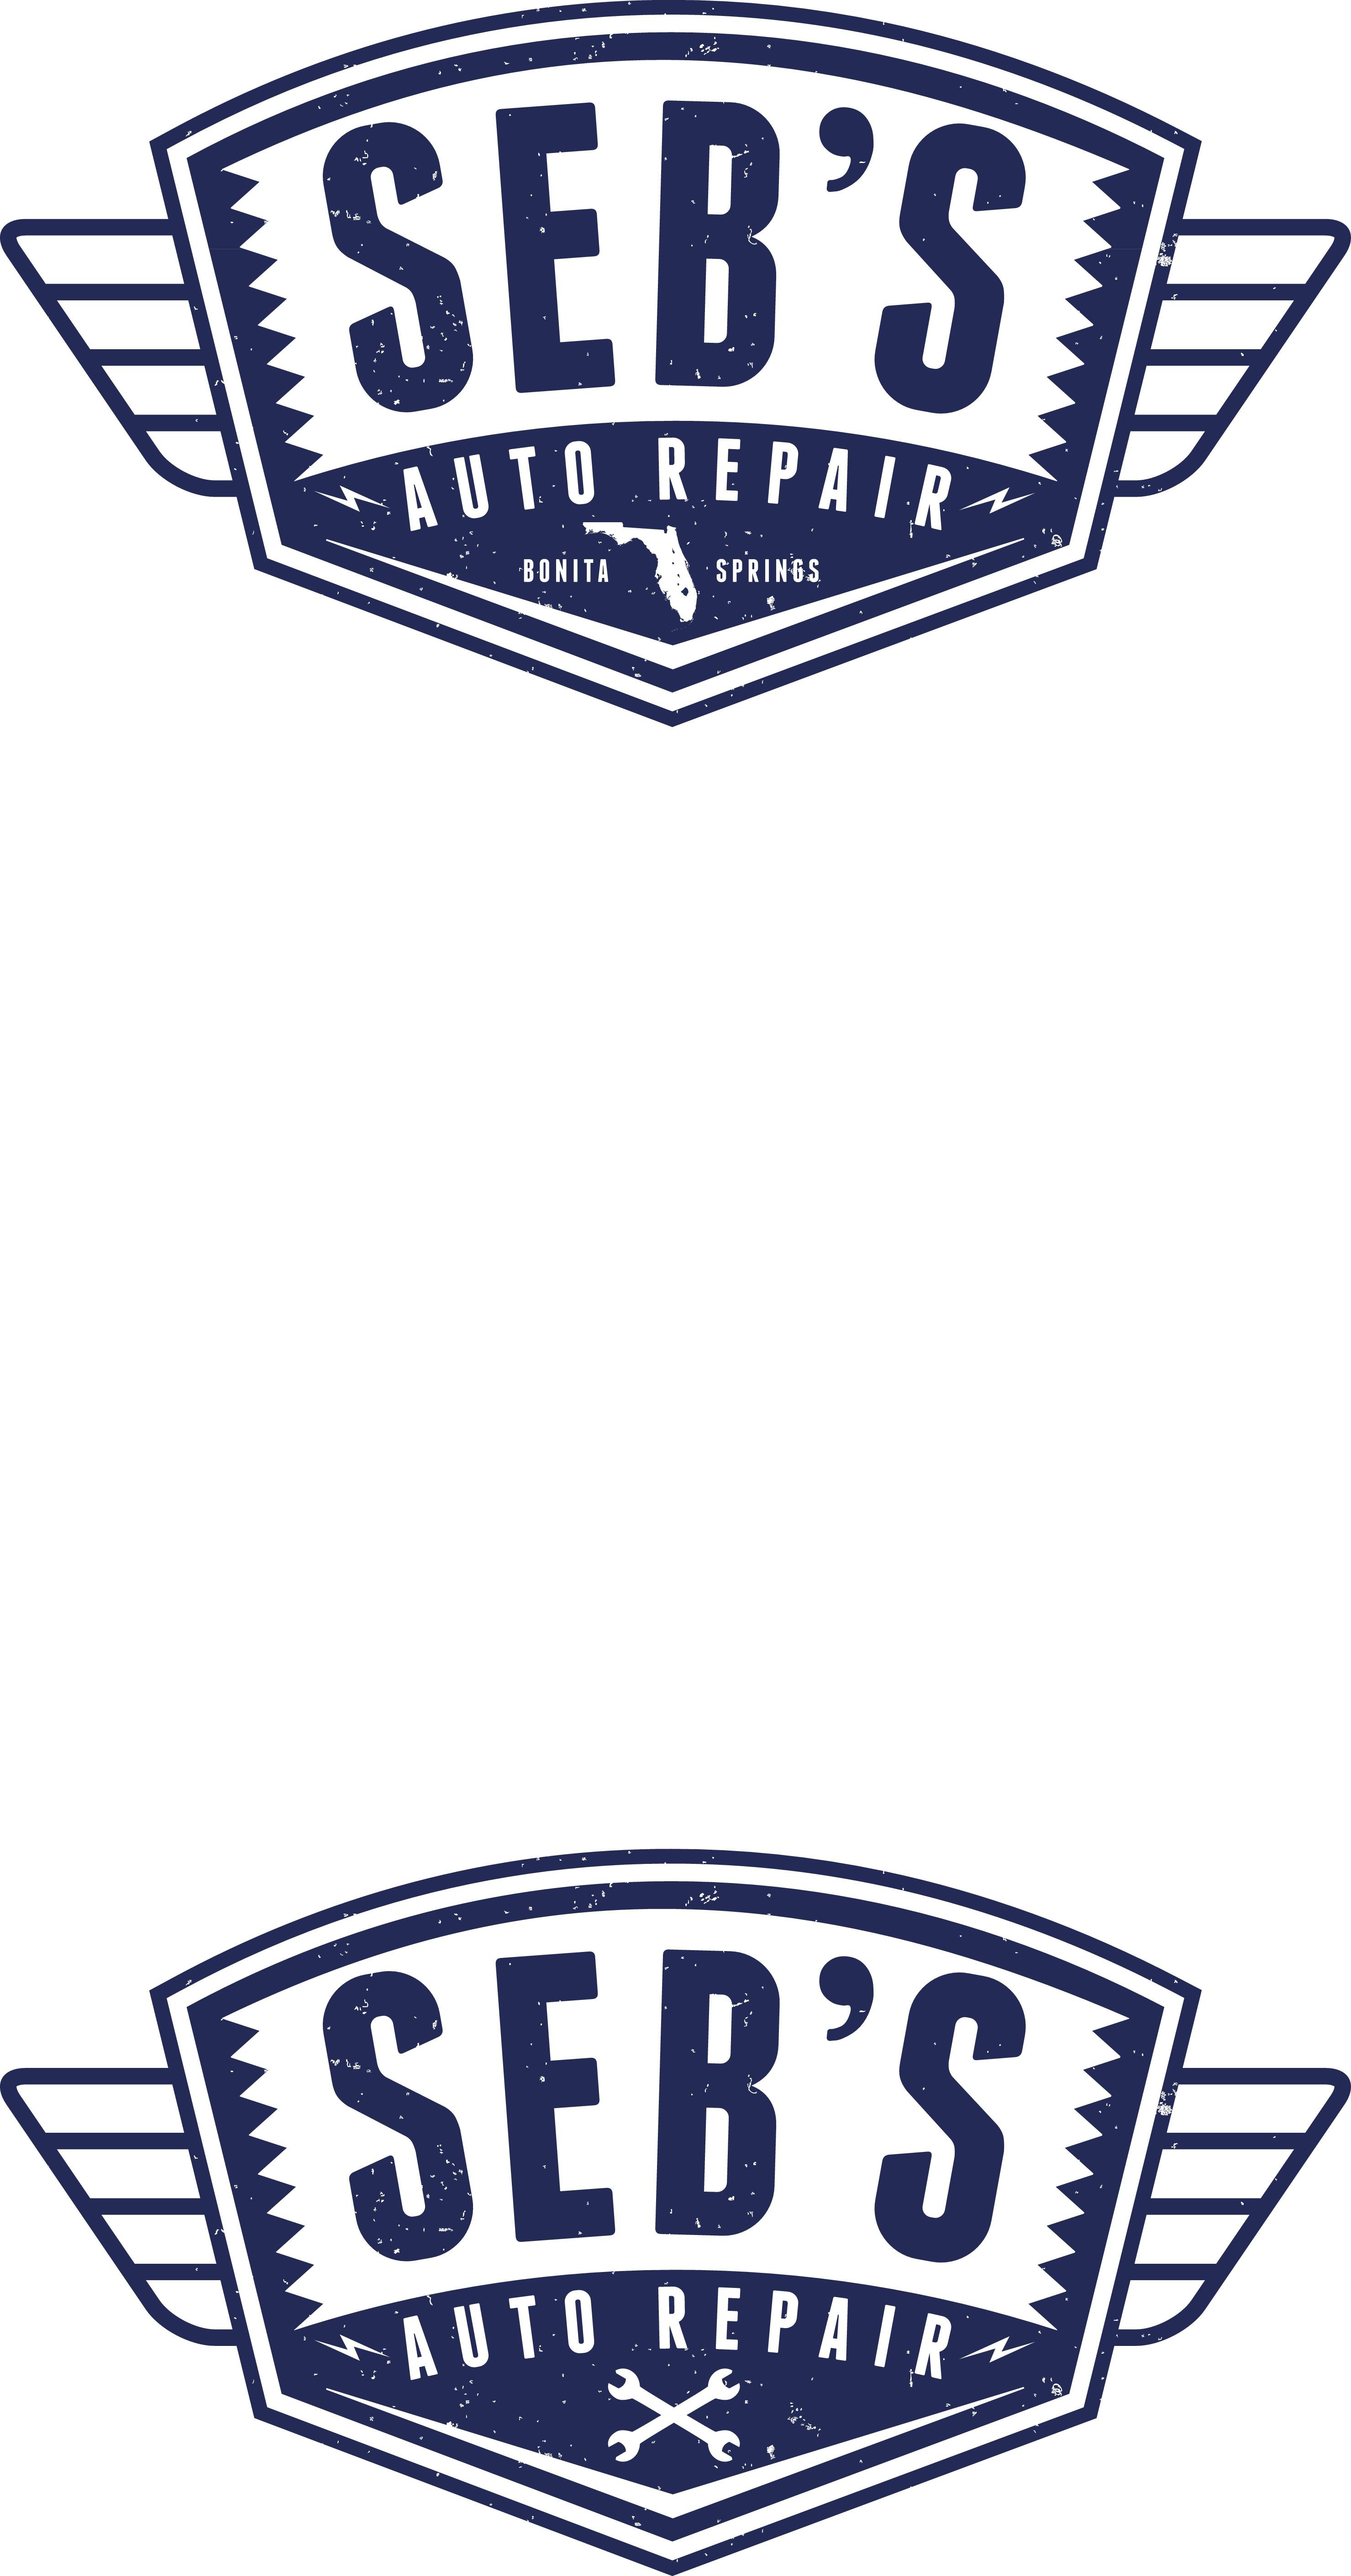 Make us a badass logo for a nice auto repair